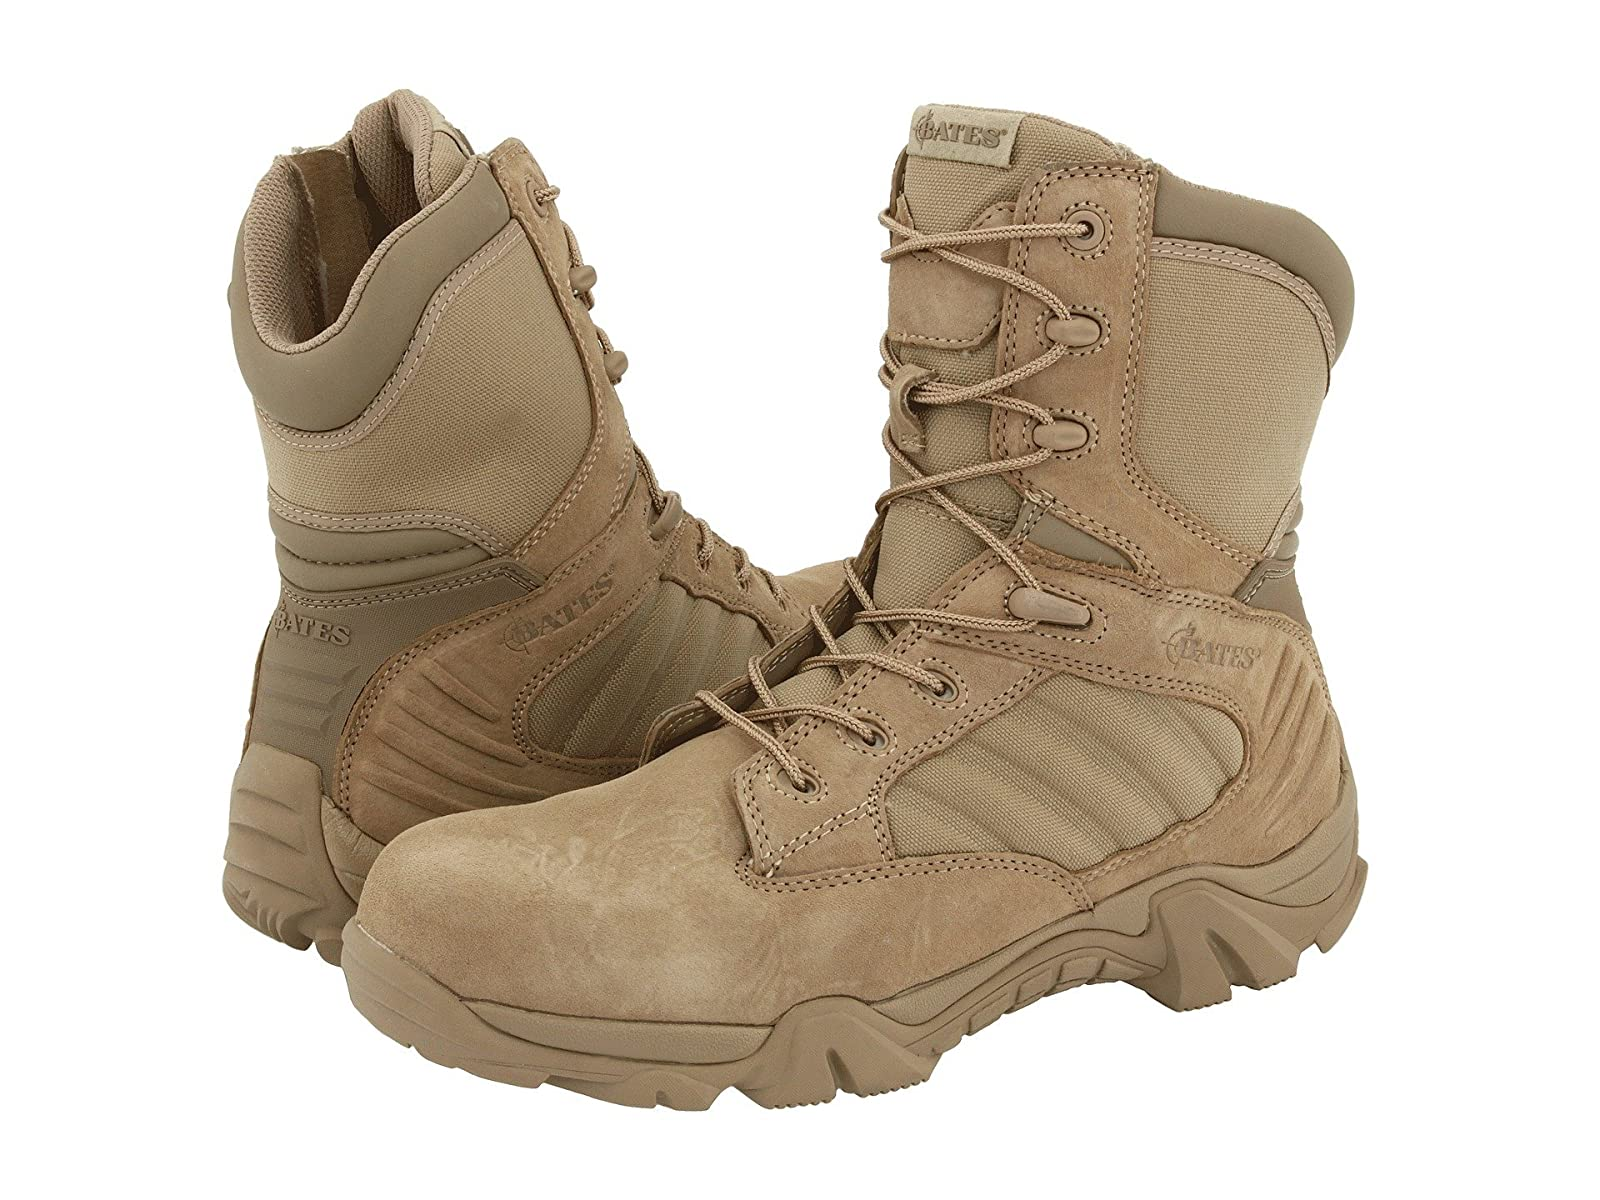 Bates Footwear GX-8 Desert Desert GX-8 Composite Toe 49ce20